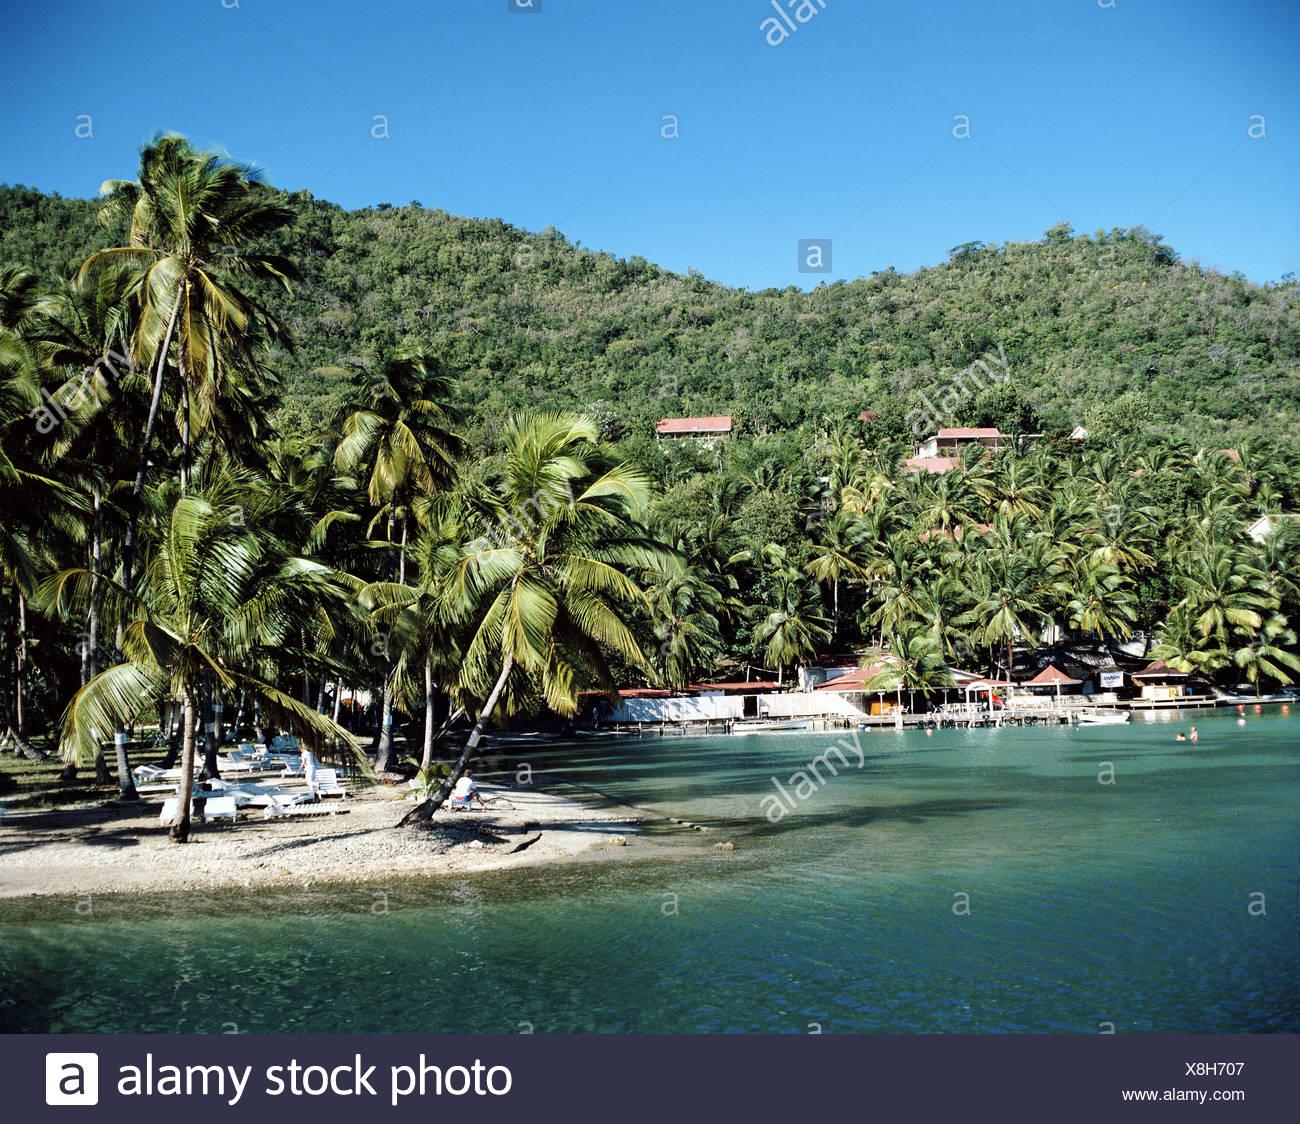 Caribbean Saint Lucia Caribbean Marigot Bay palms yachts - Stock Image